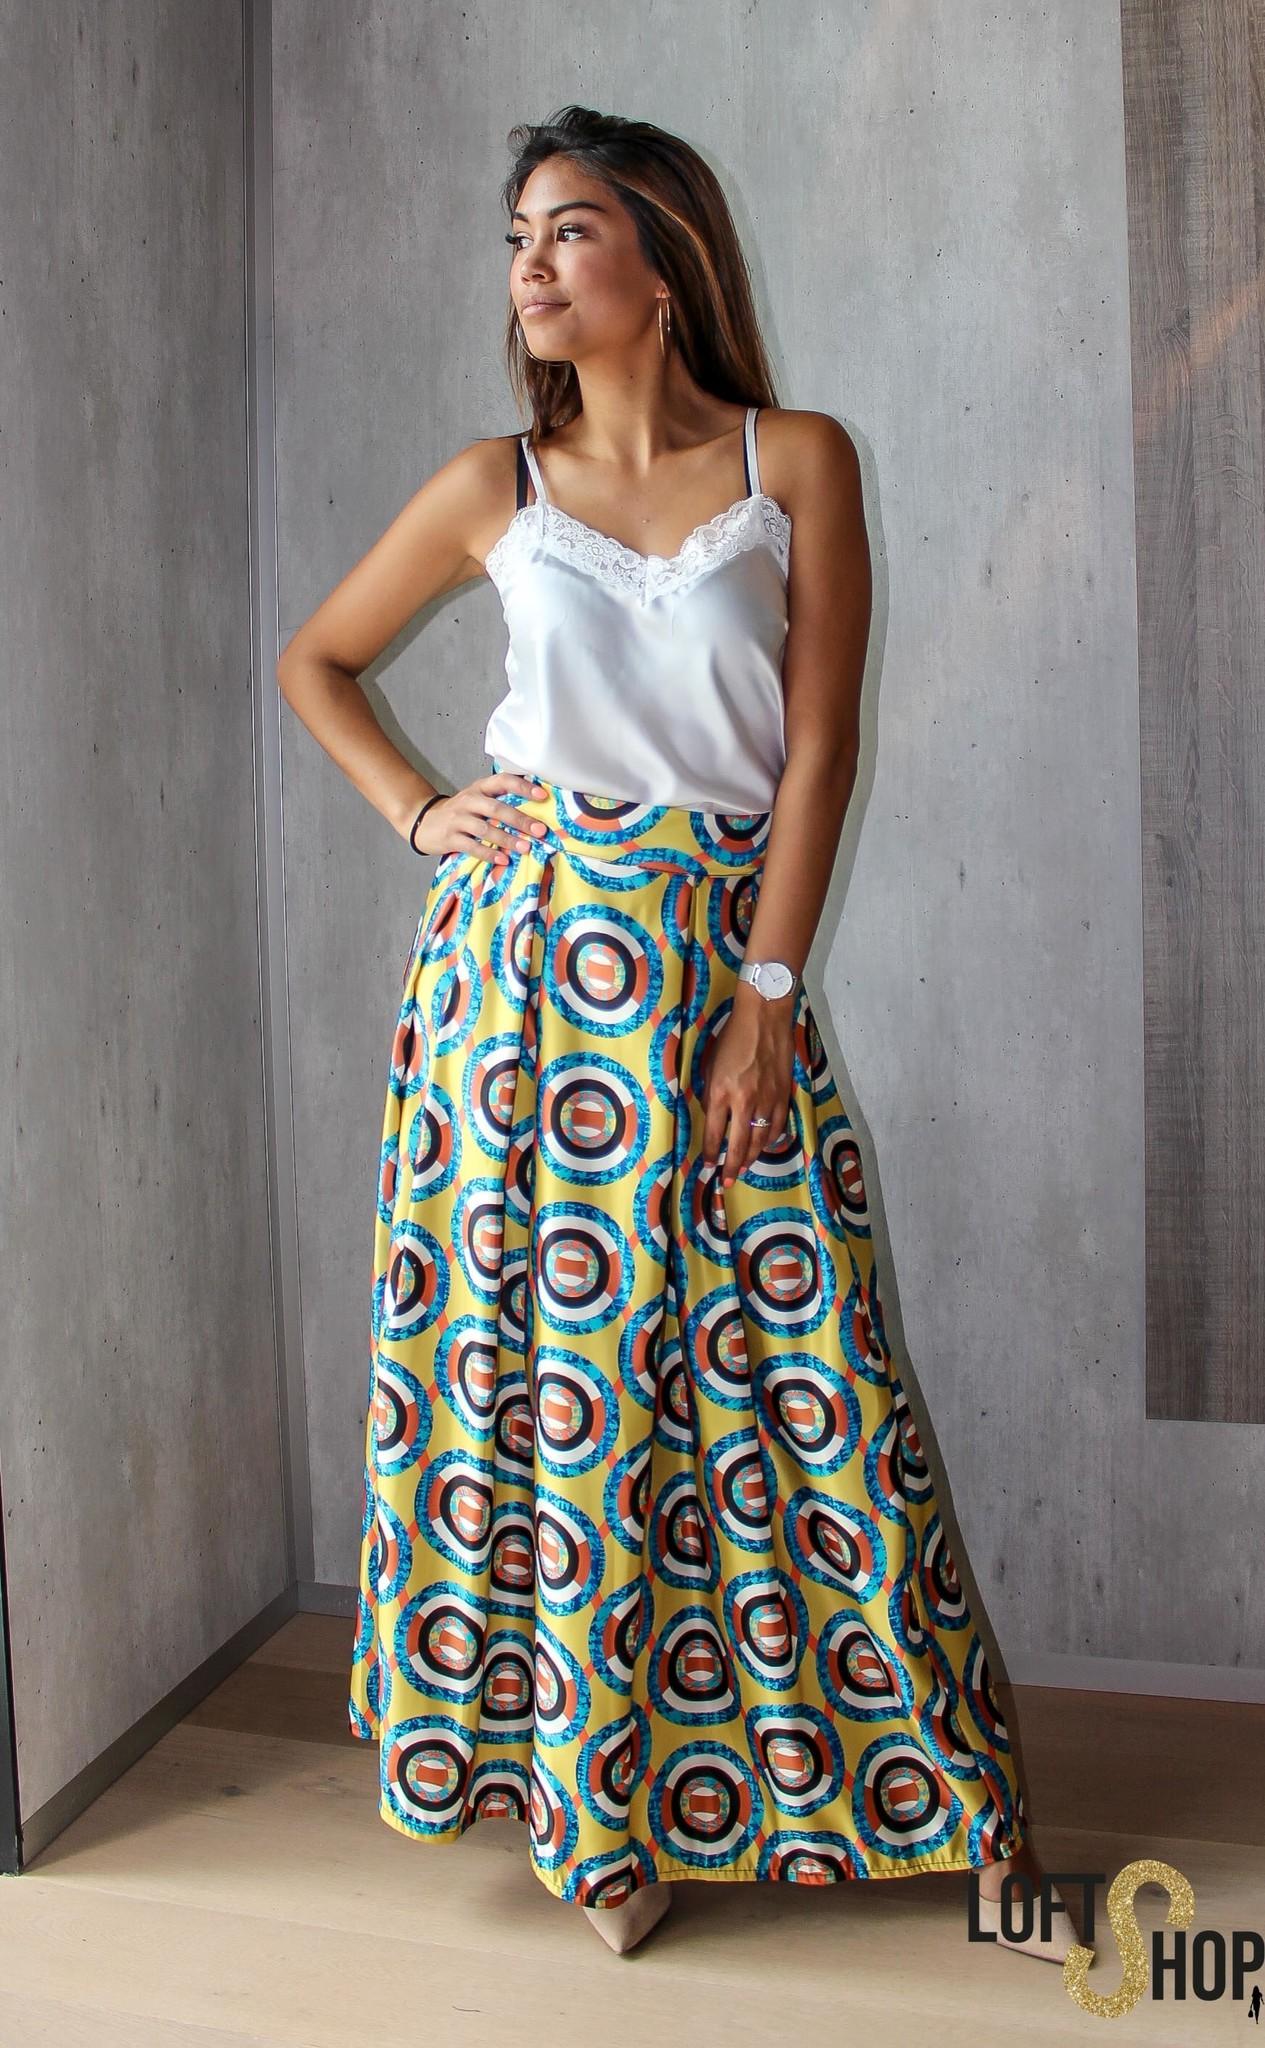 J&D Fashio Skirt Donna Circle